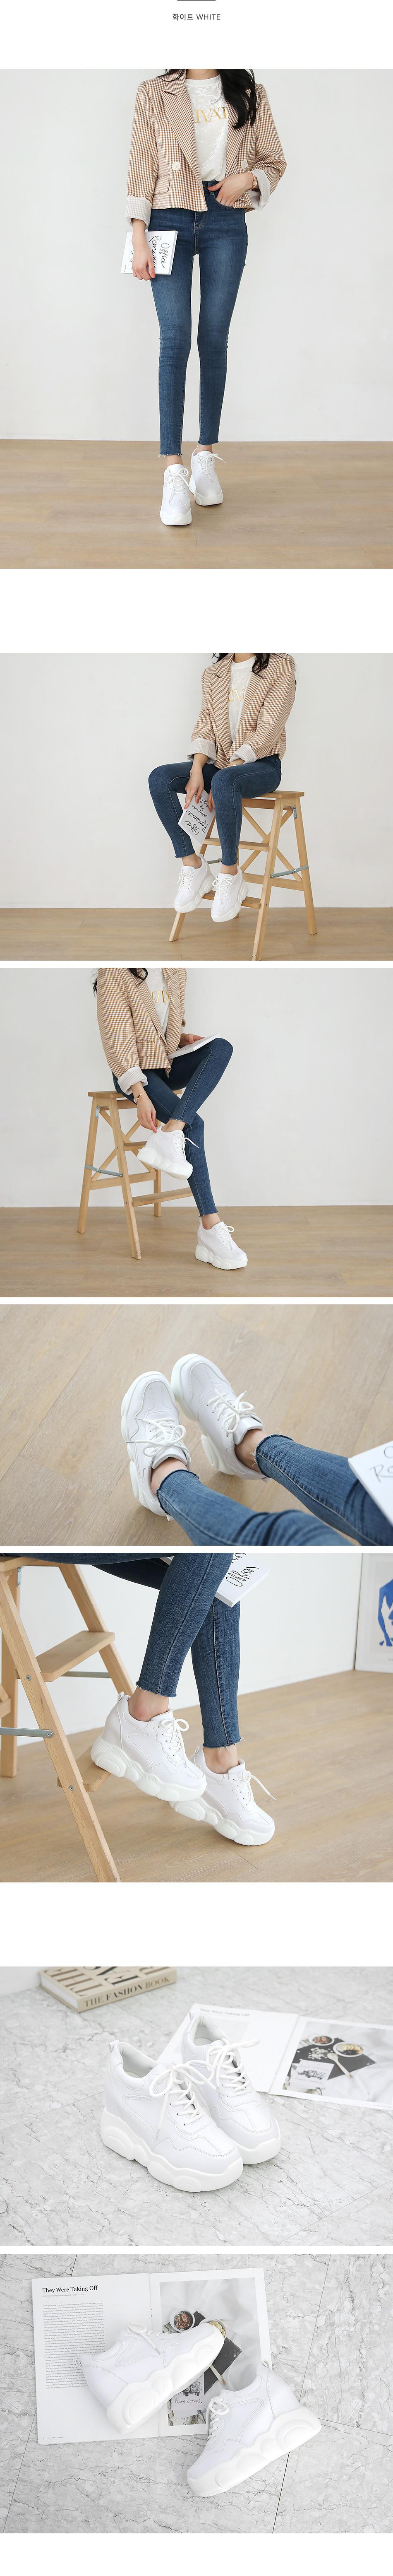 Glea height sneakers 9cm